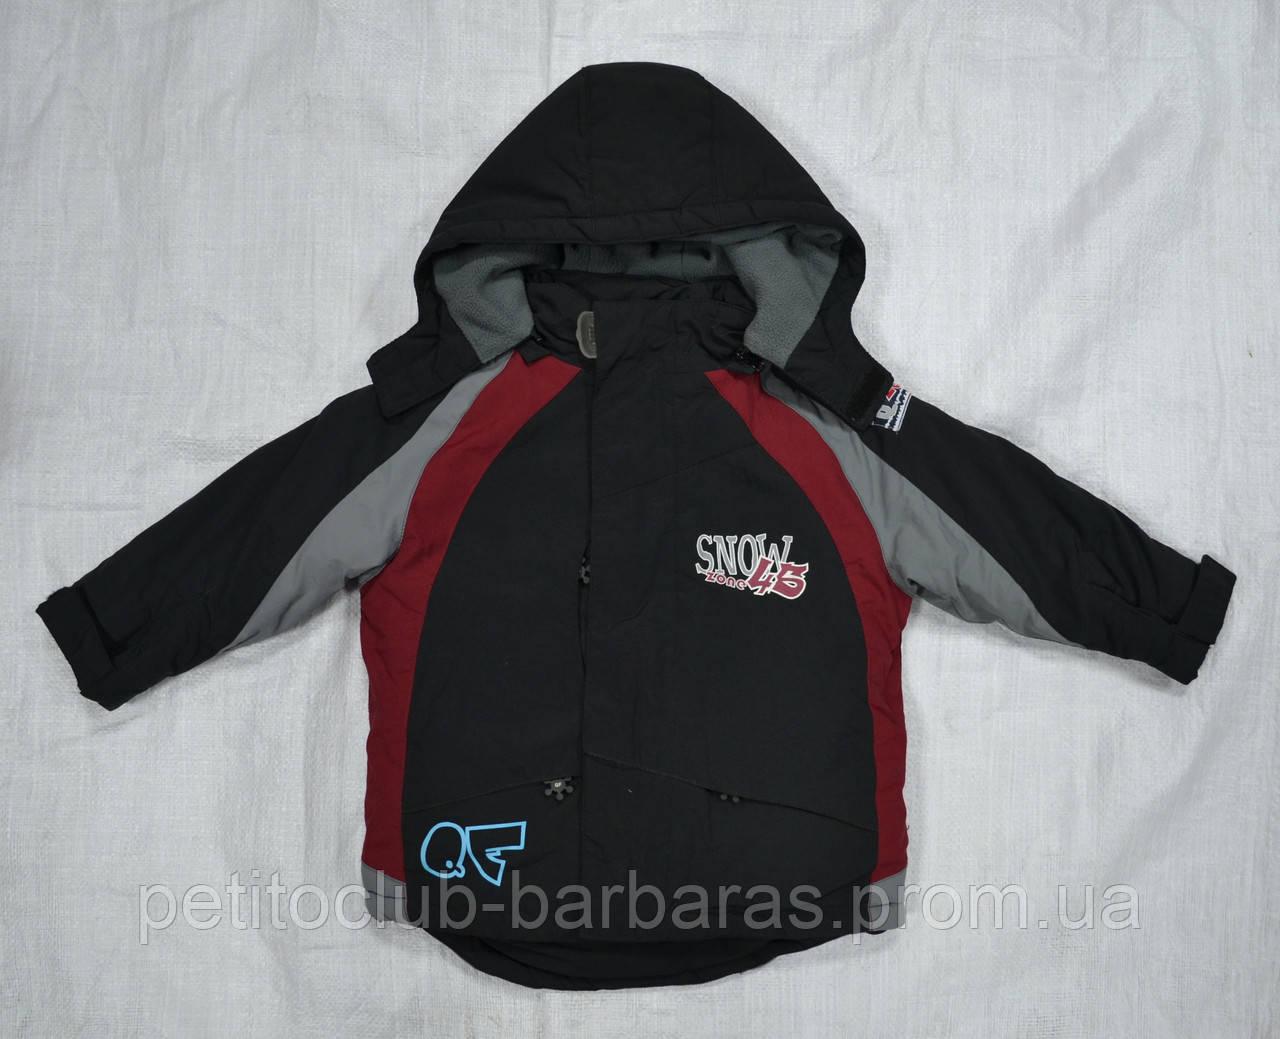 Куртка зимняя Snowzone 45 черная (QuadriFoglio, Польша)